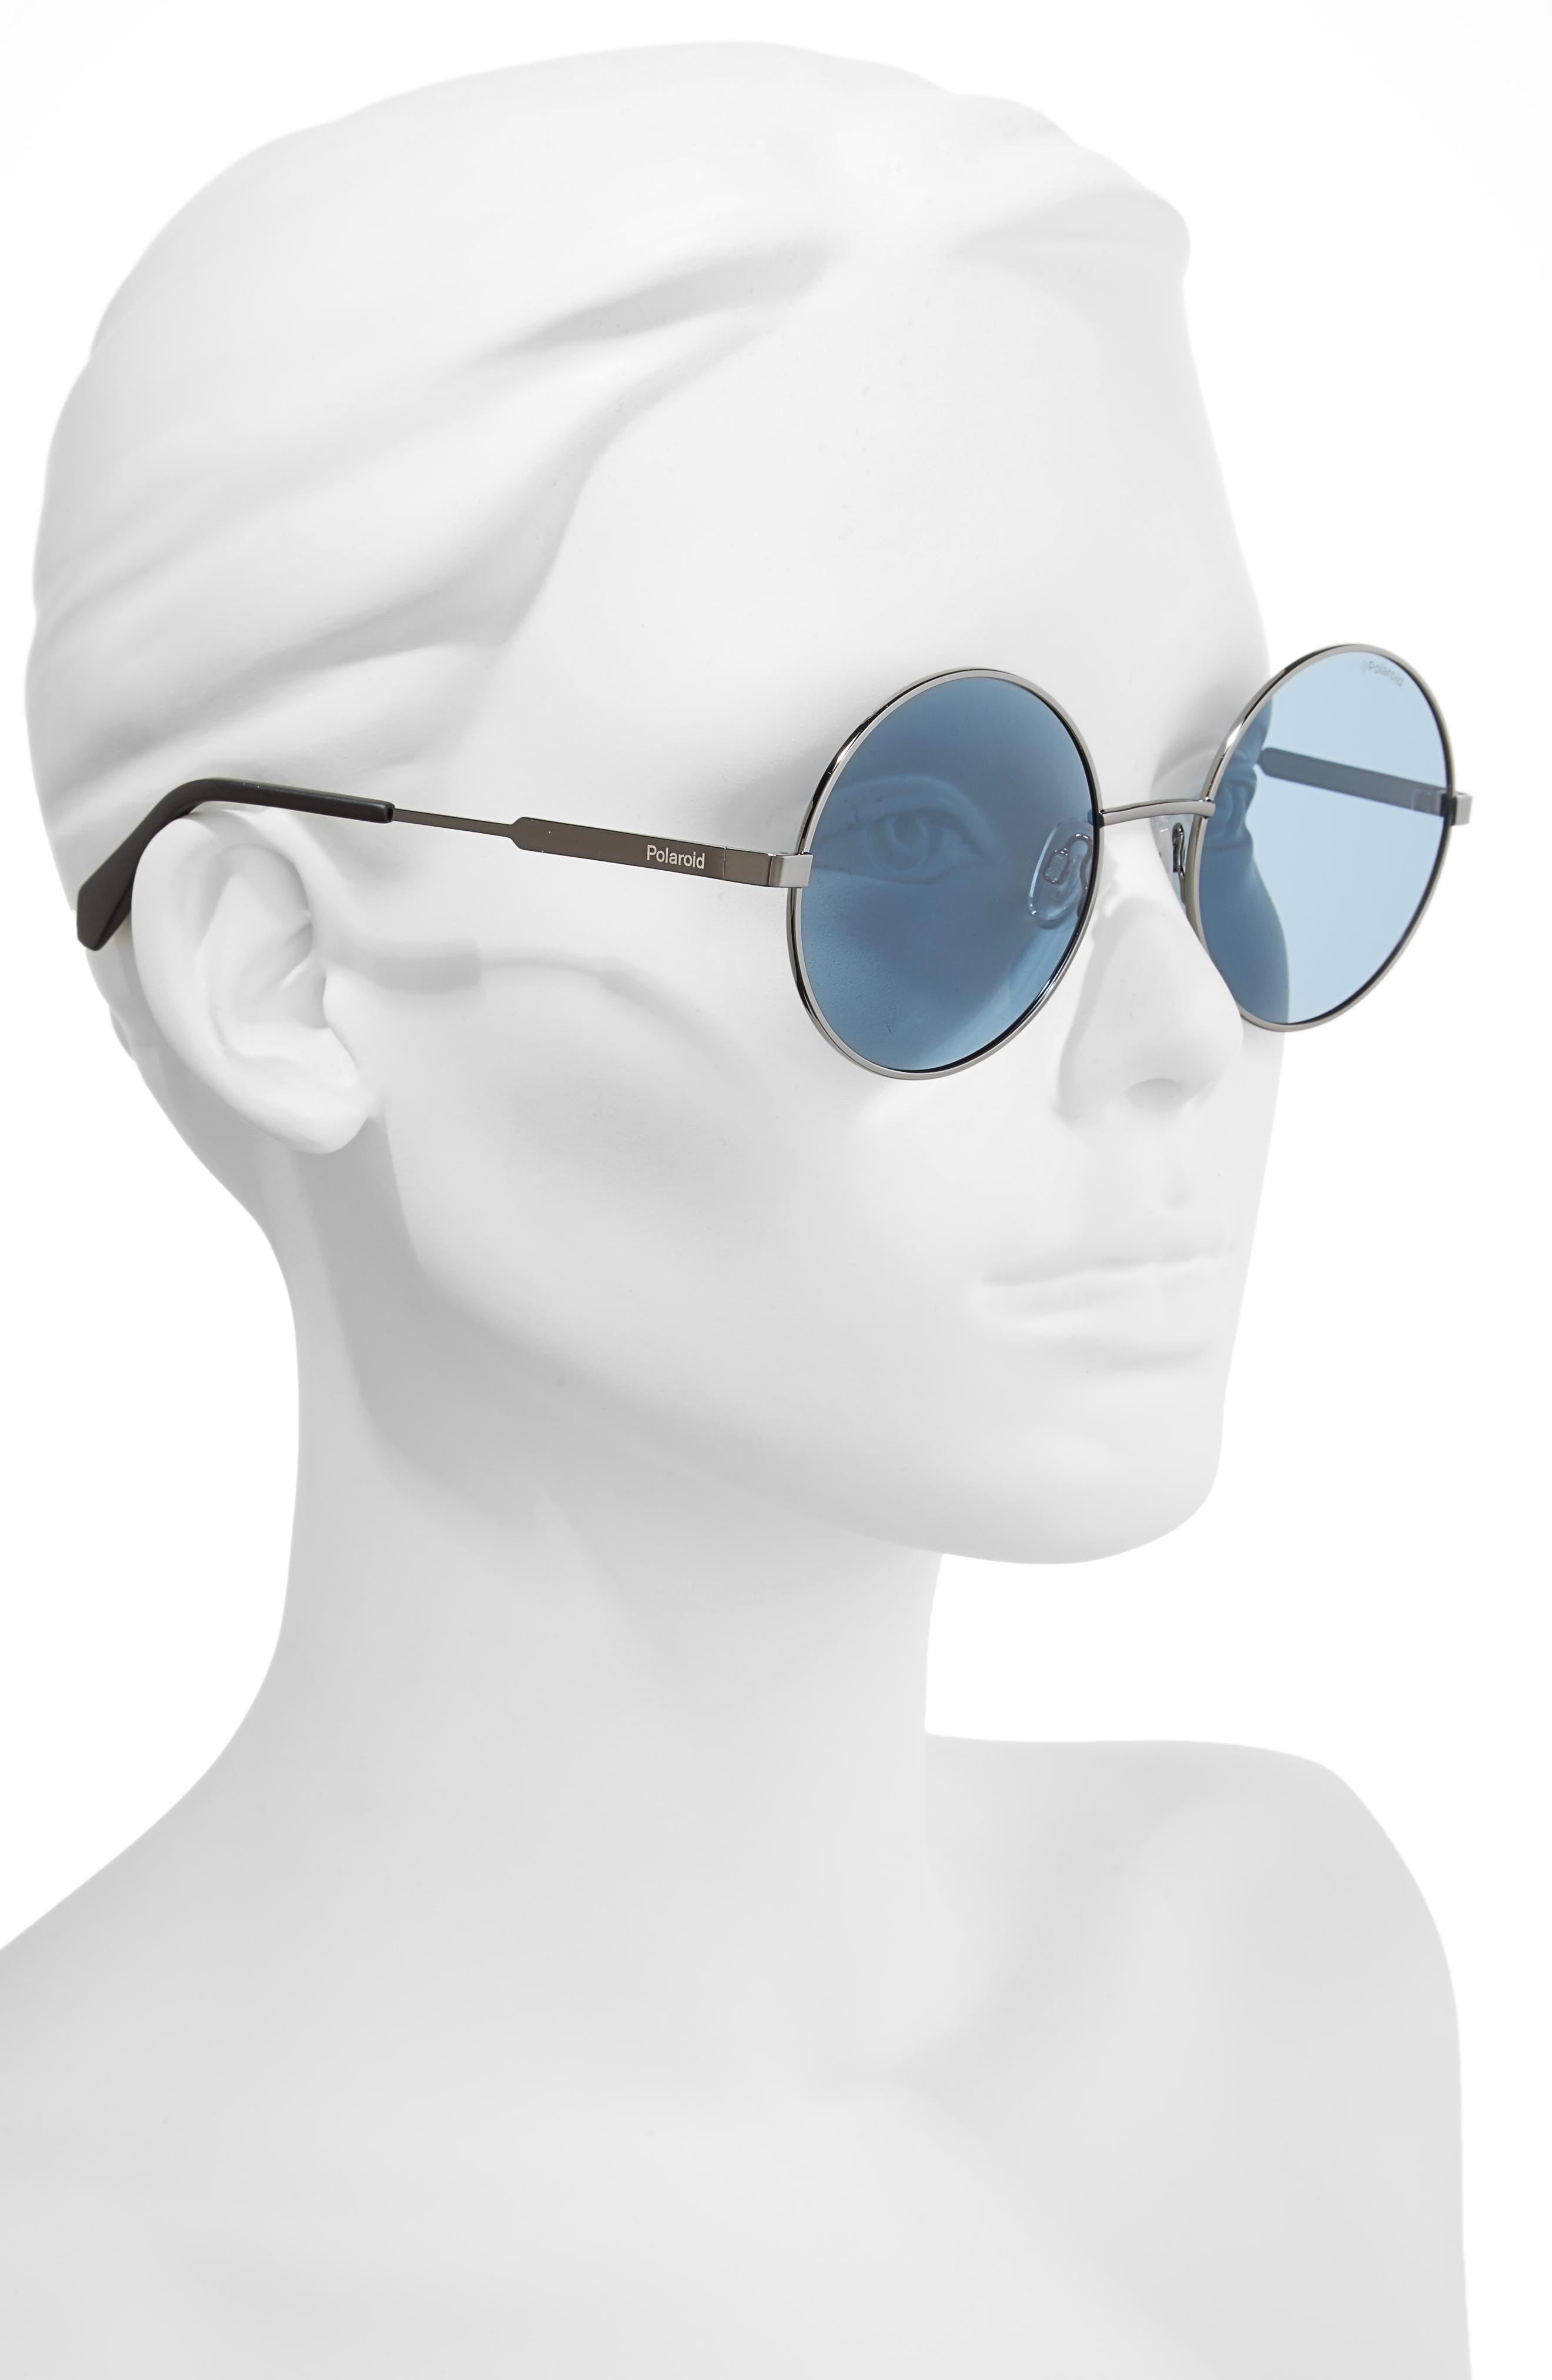 55mm Polarized Round Sunglasses,                             Alternate thumbnail 6, color,